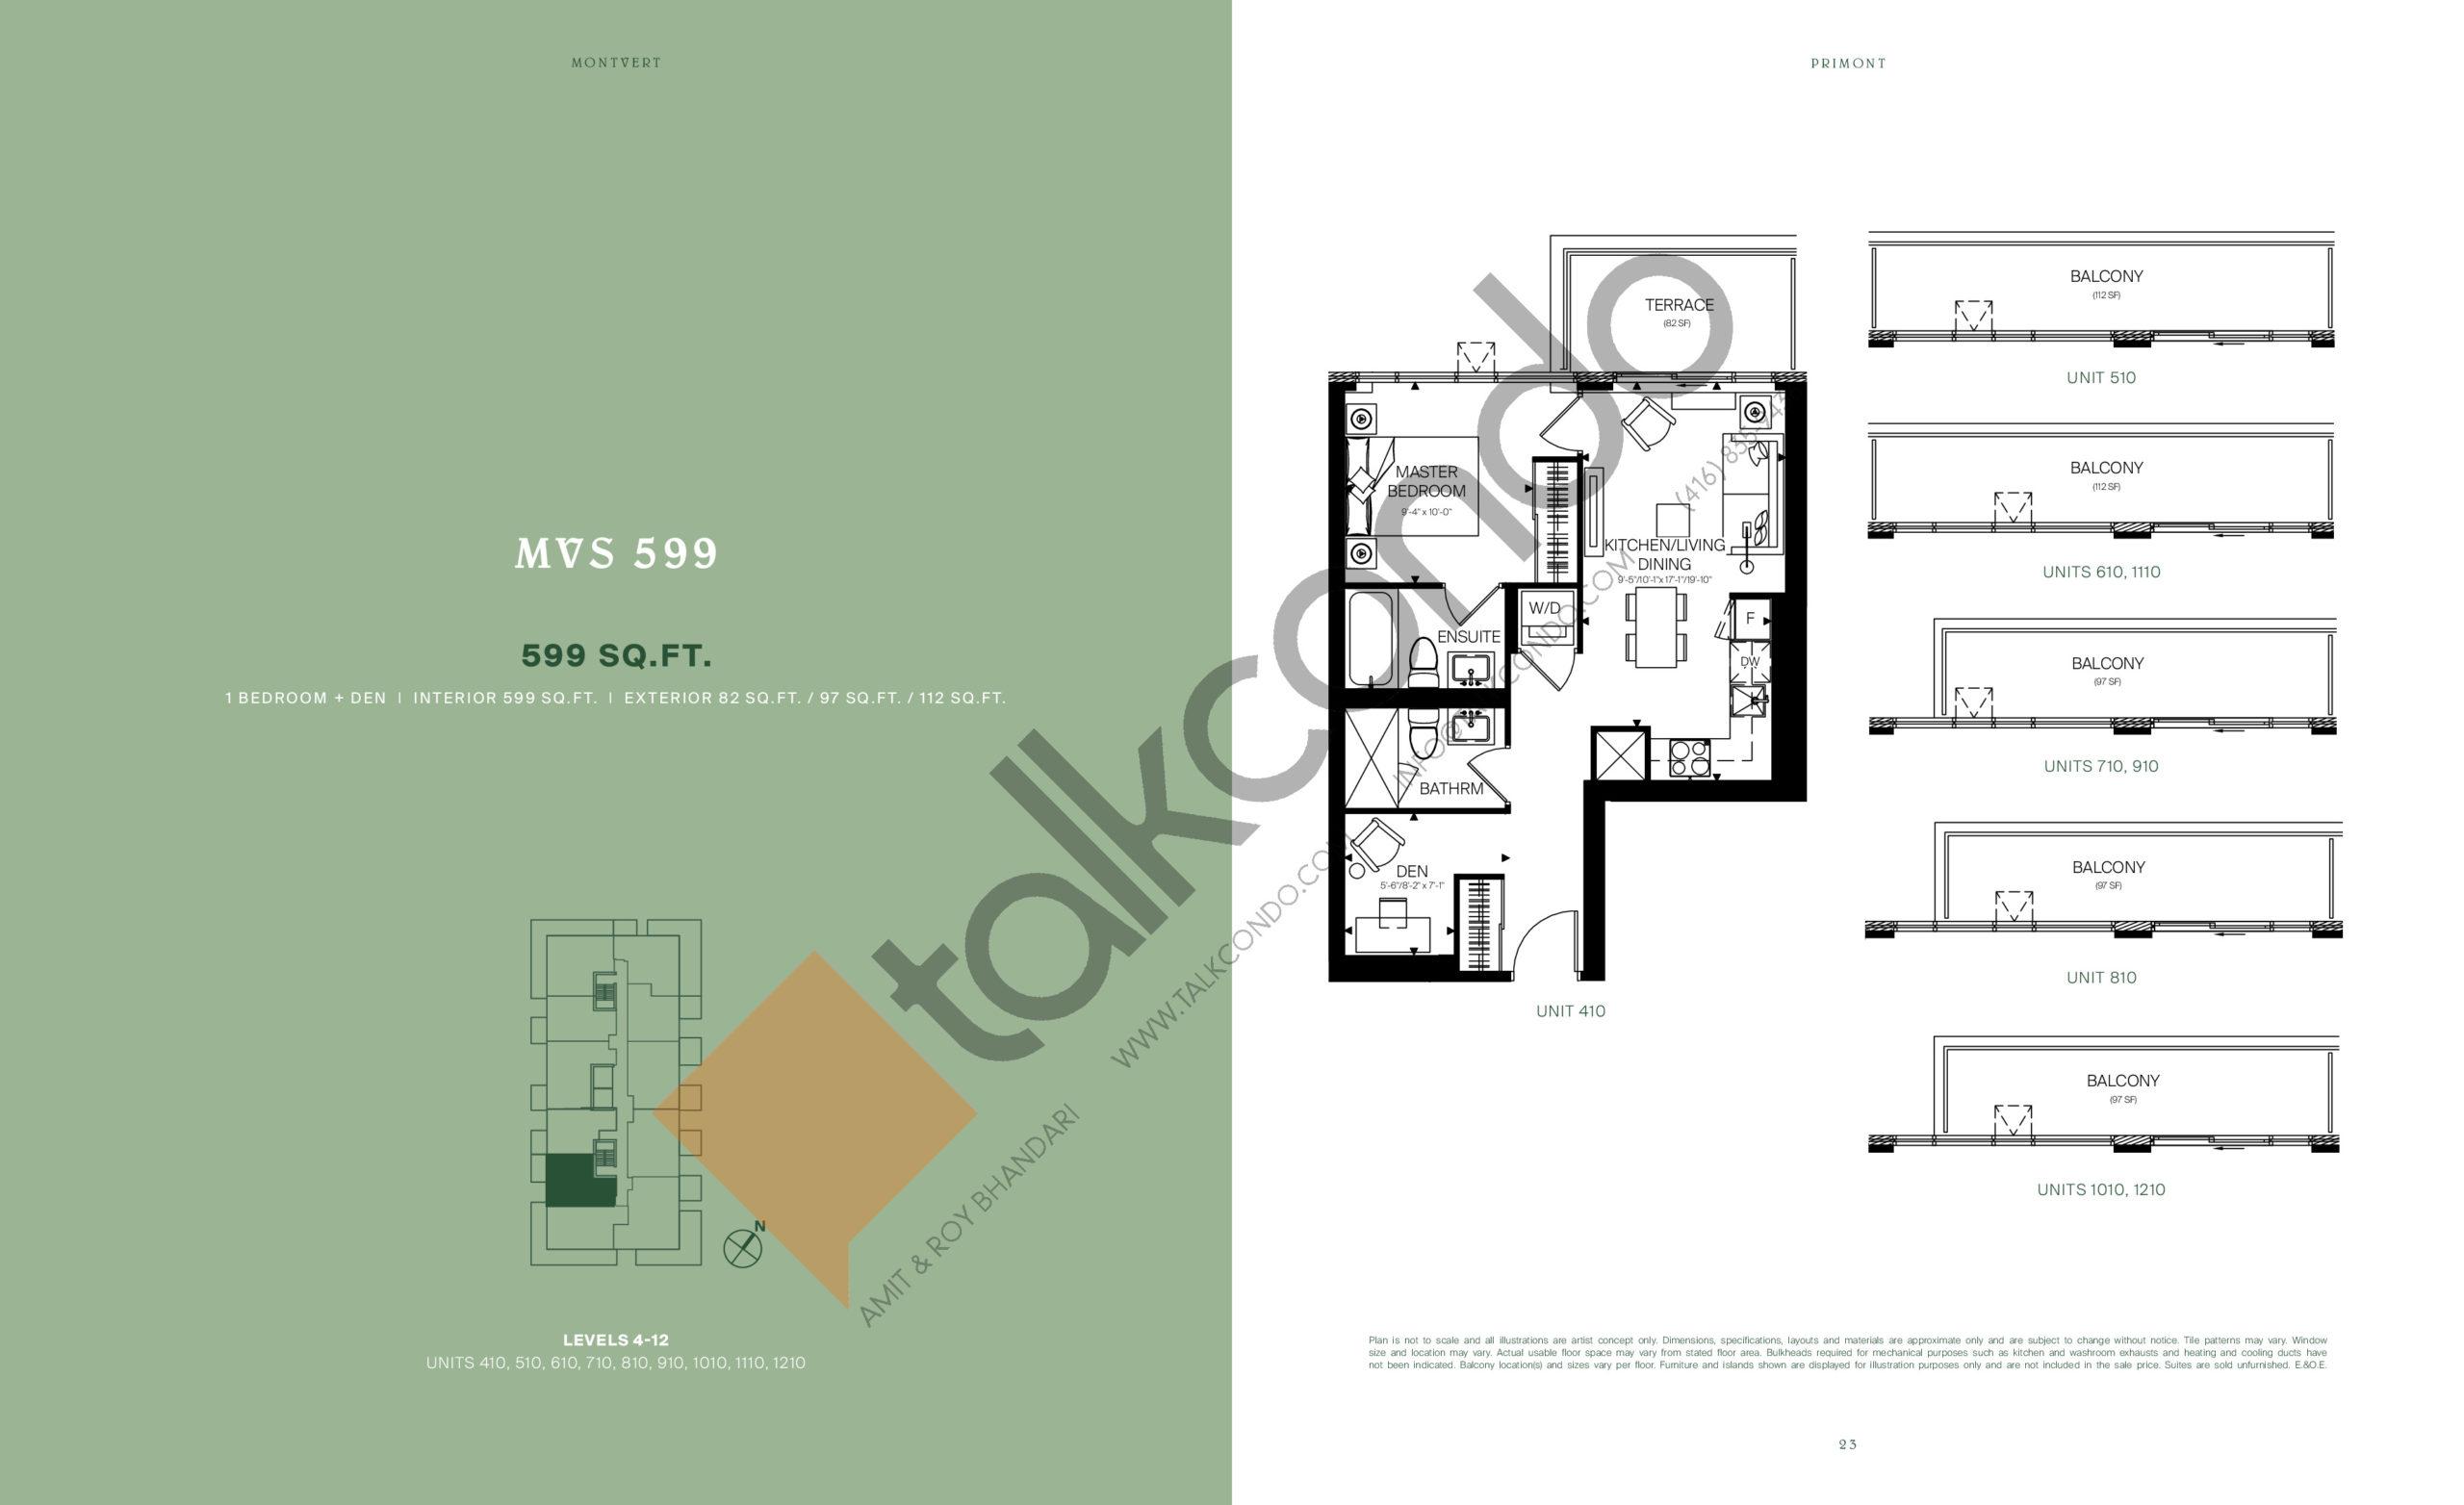 MVS 599 Floor Plan at MontVert Condos - 599 sq.ft